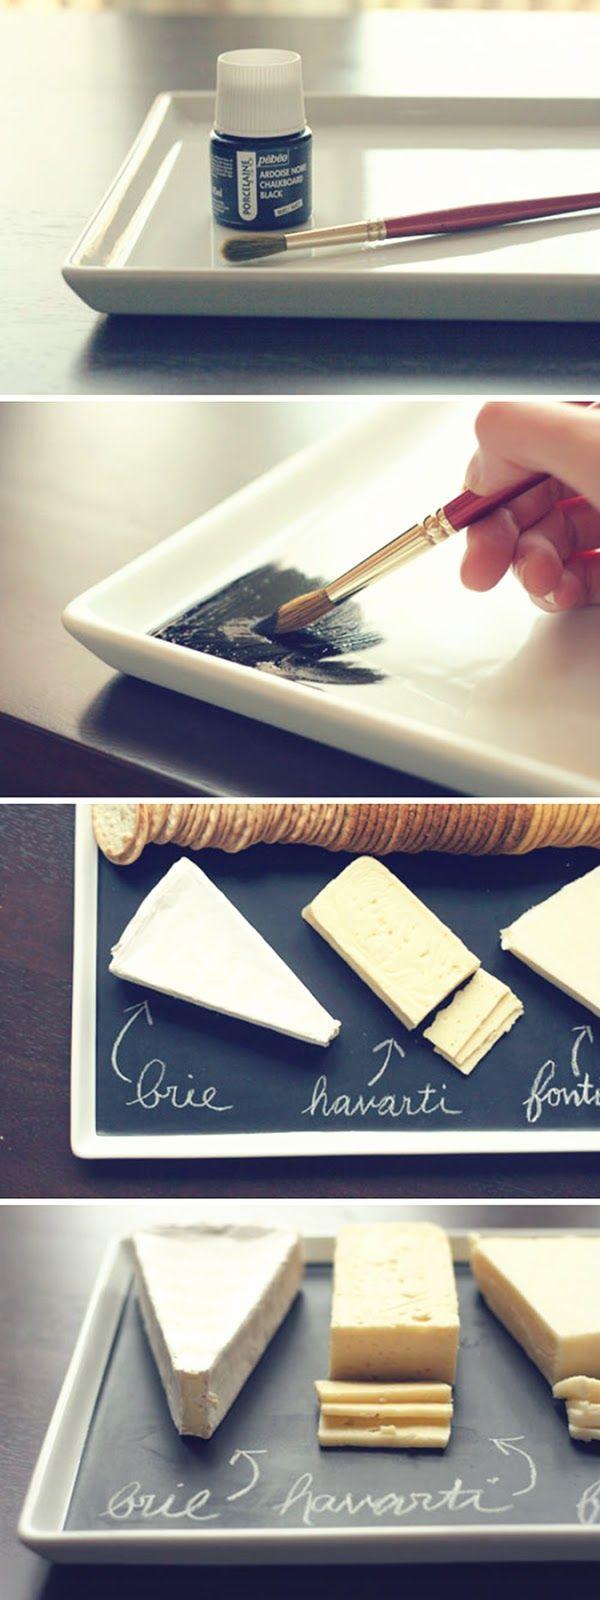 frashion: Chalkboard paint ideas / Ideje za farbu za podlogu za pisanje kredom...